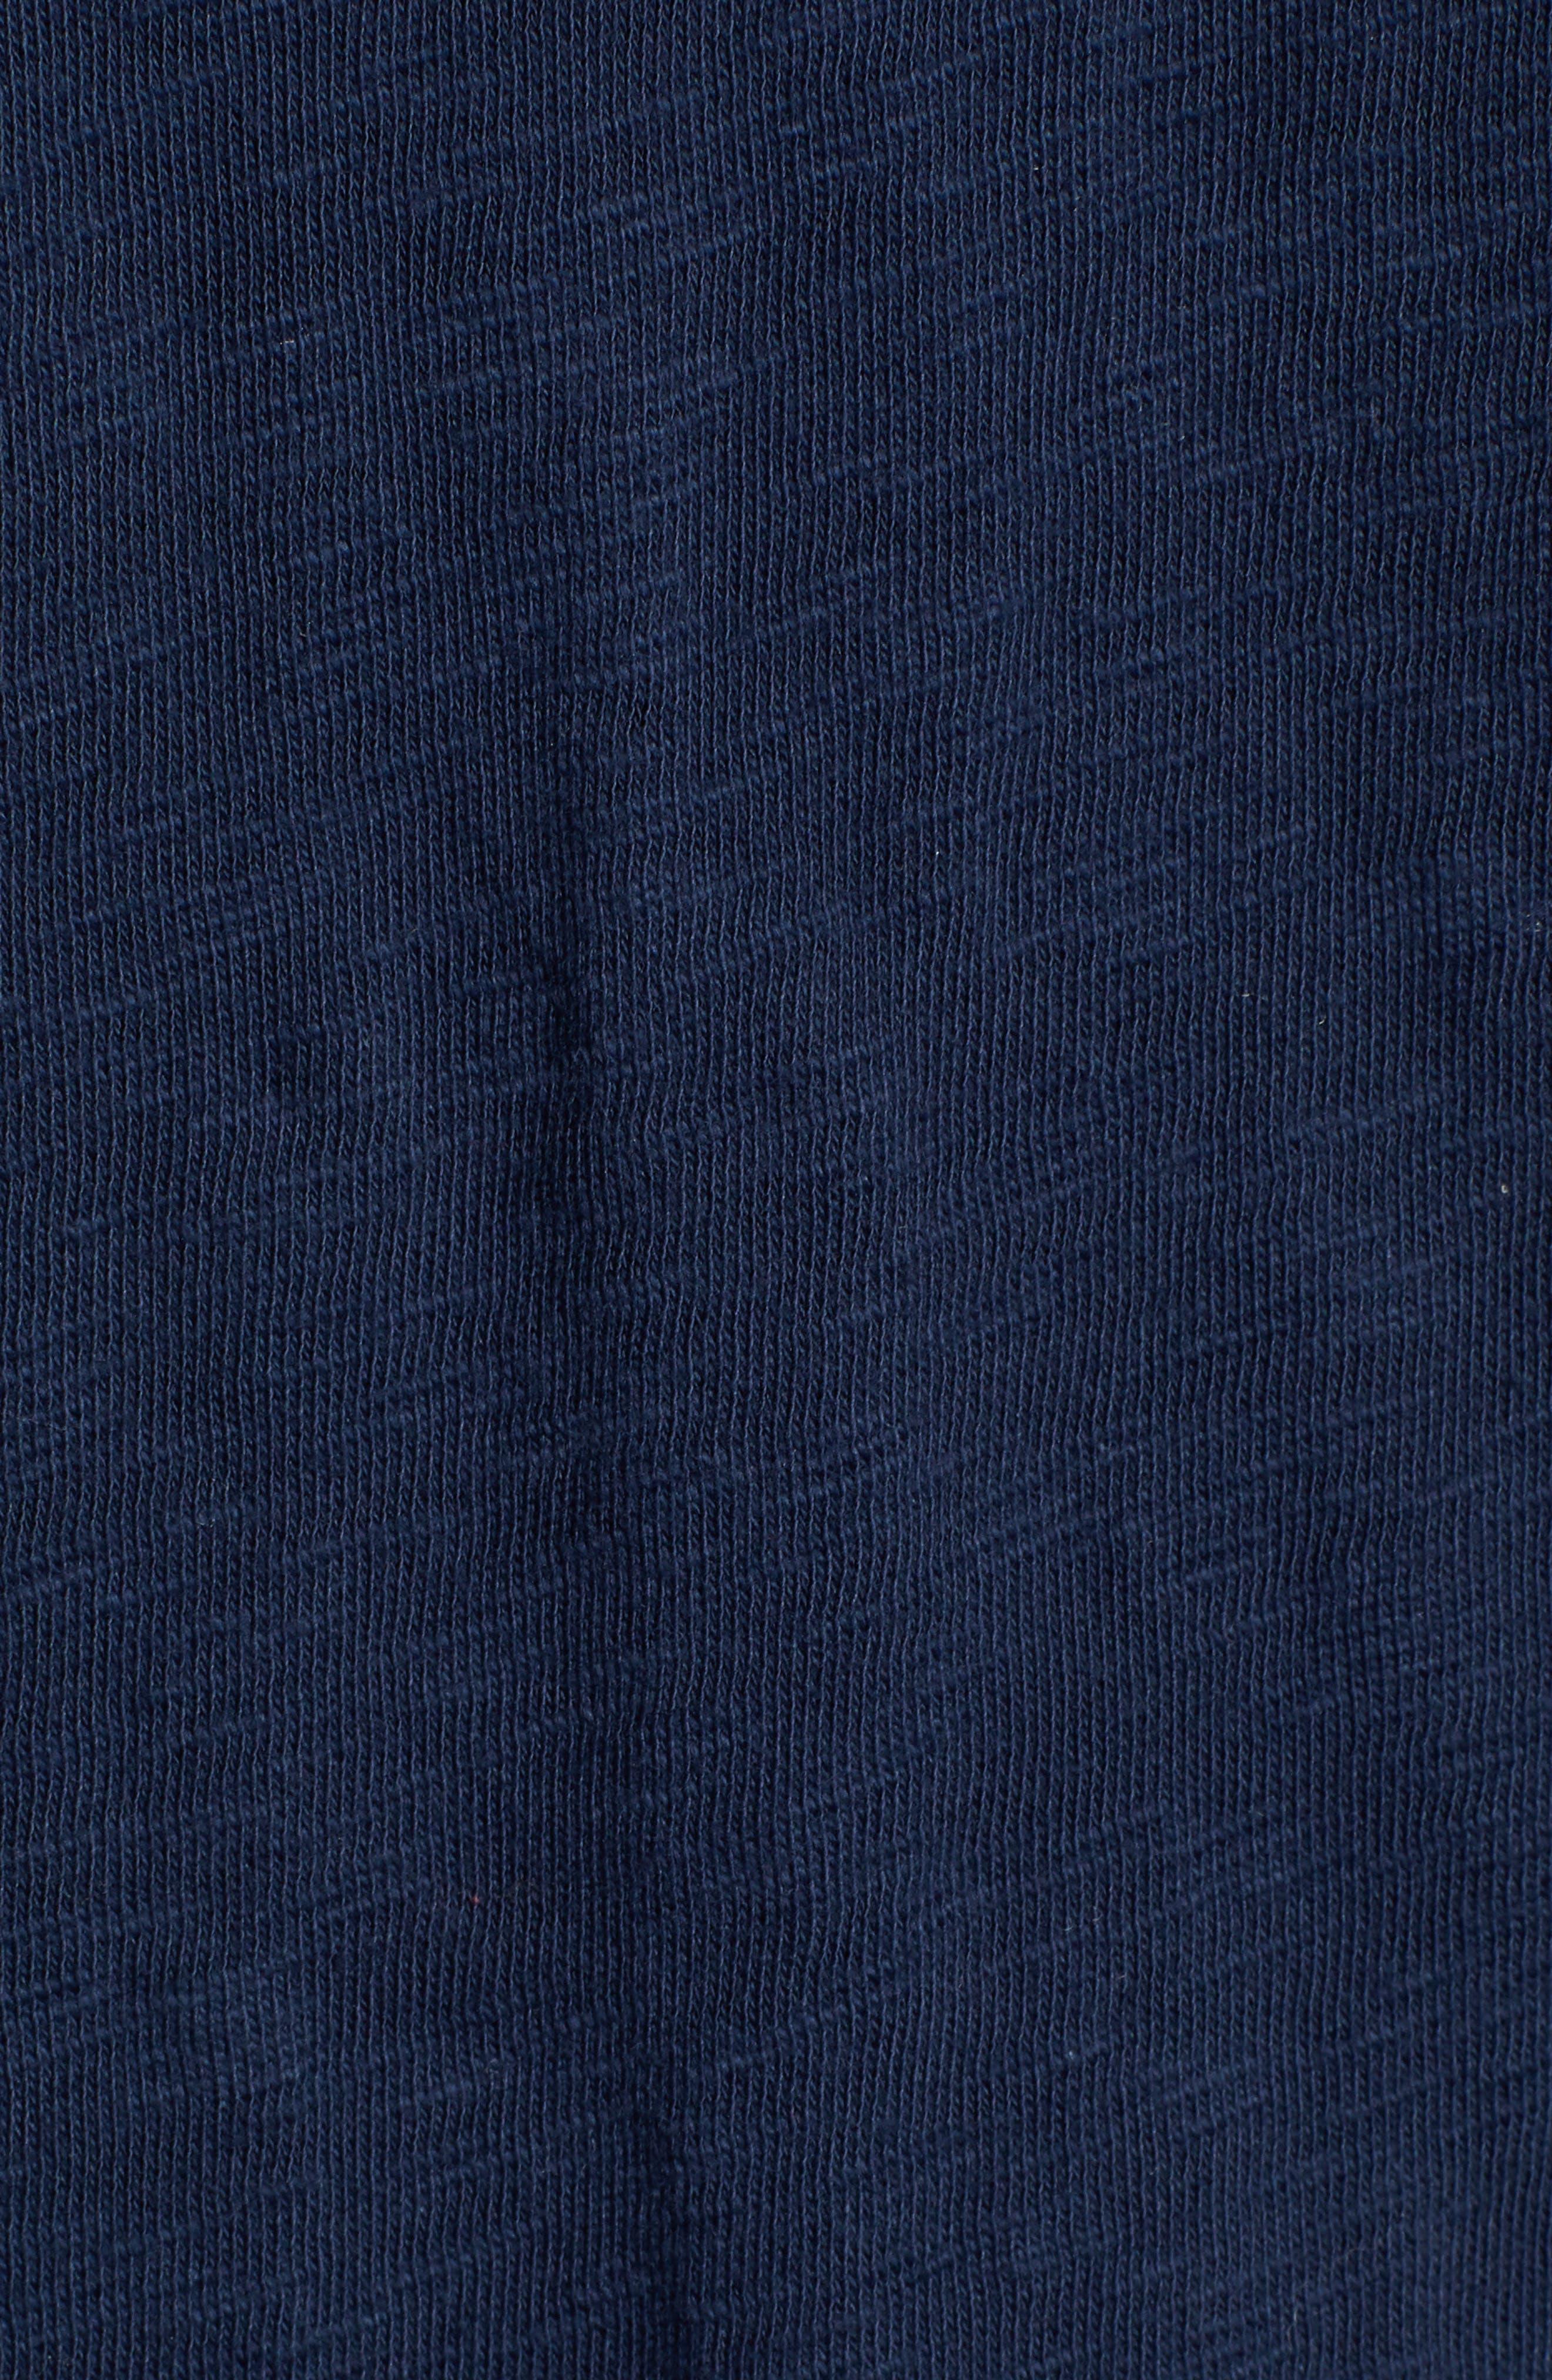 Stinson Hooded Long Sleeve Henley,                             Alternate thumbnail 5, color,                             NAVY